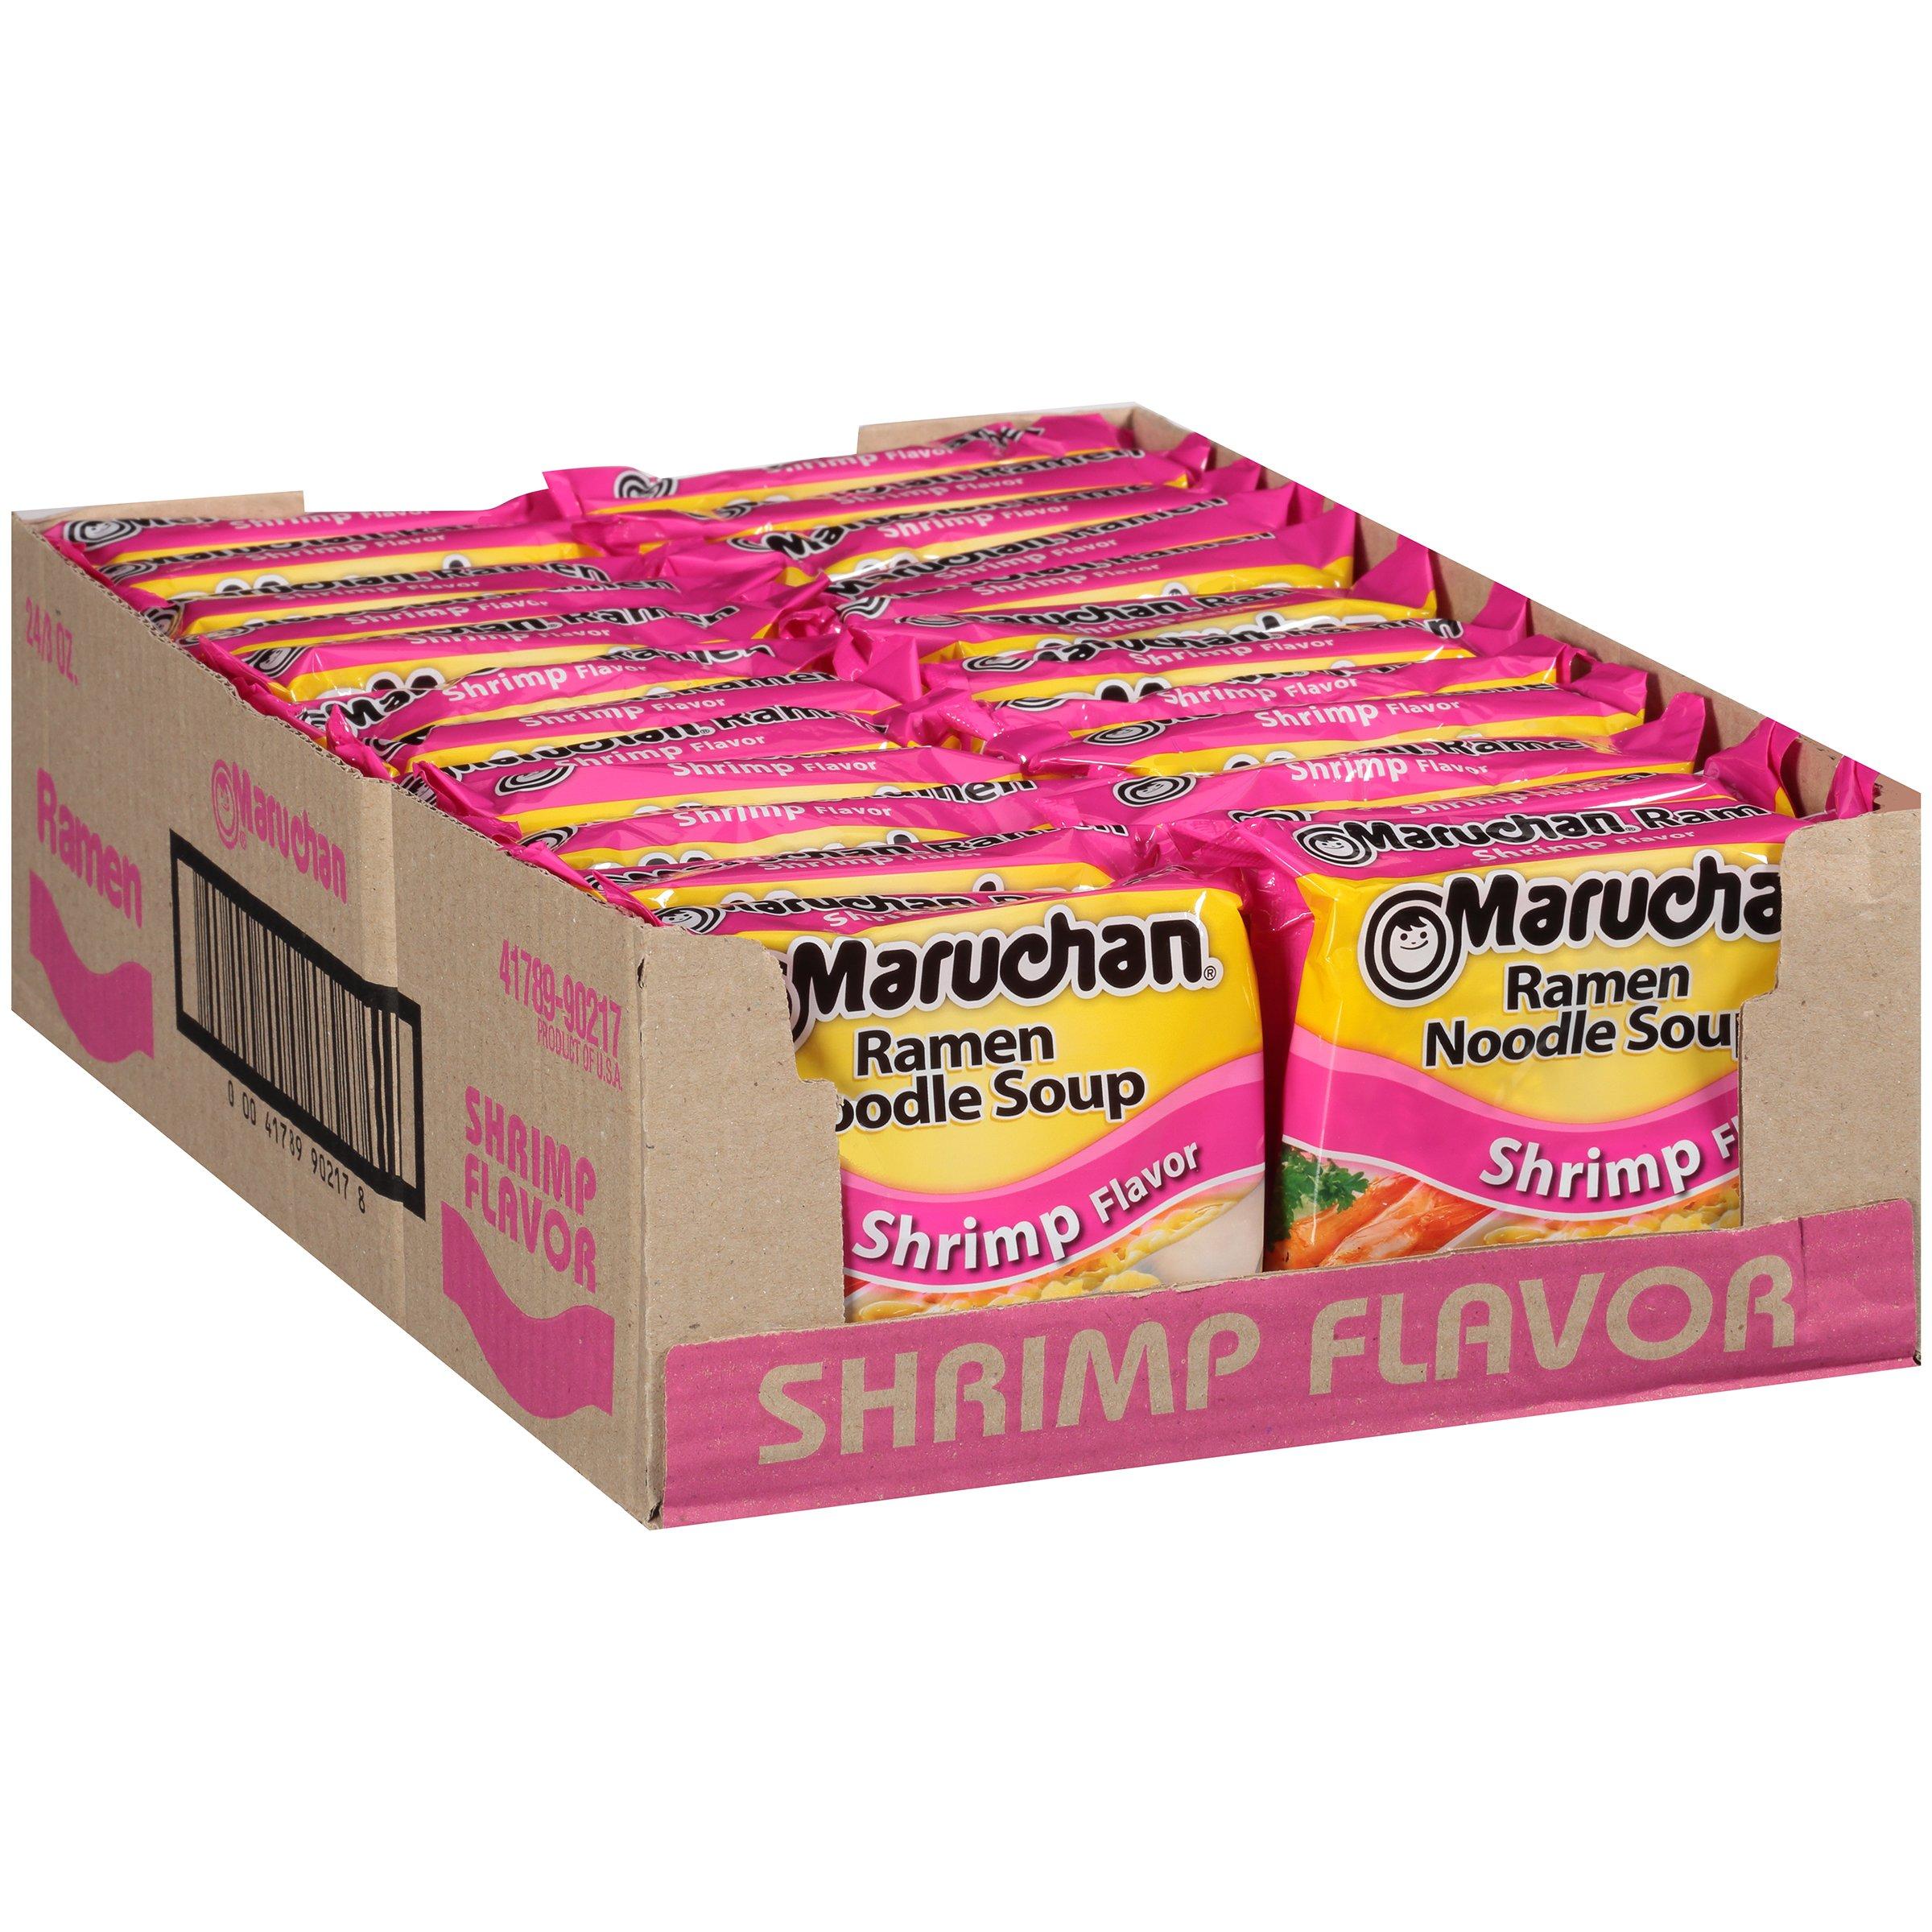 Maruchan Ramen Shrimp, 3.0 Oz, 24 Count